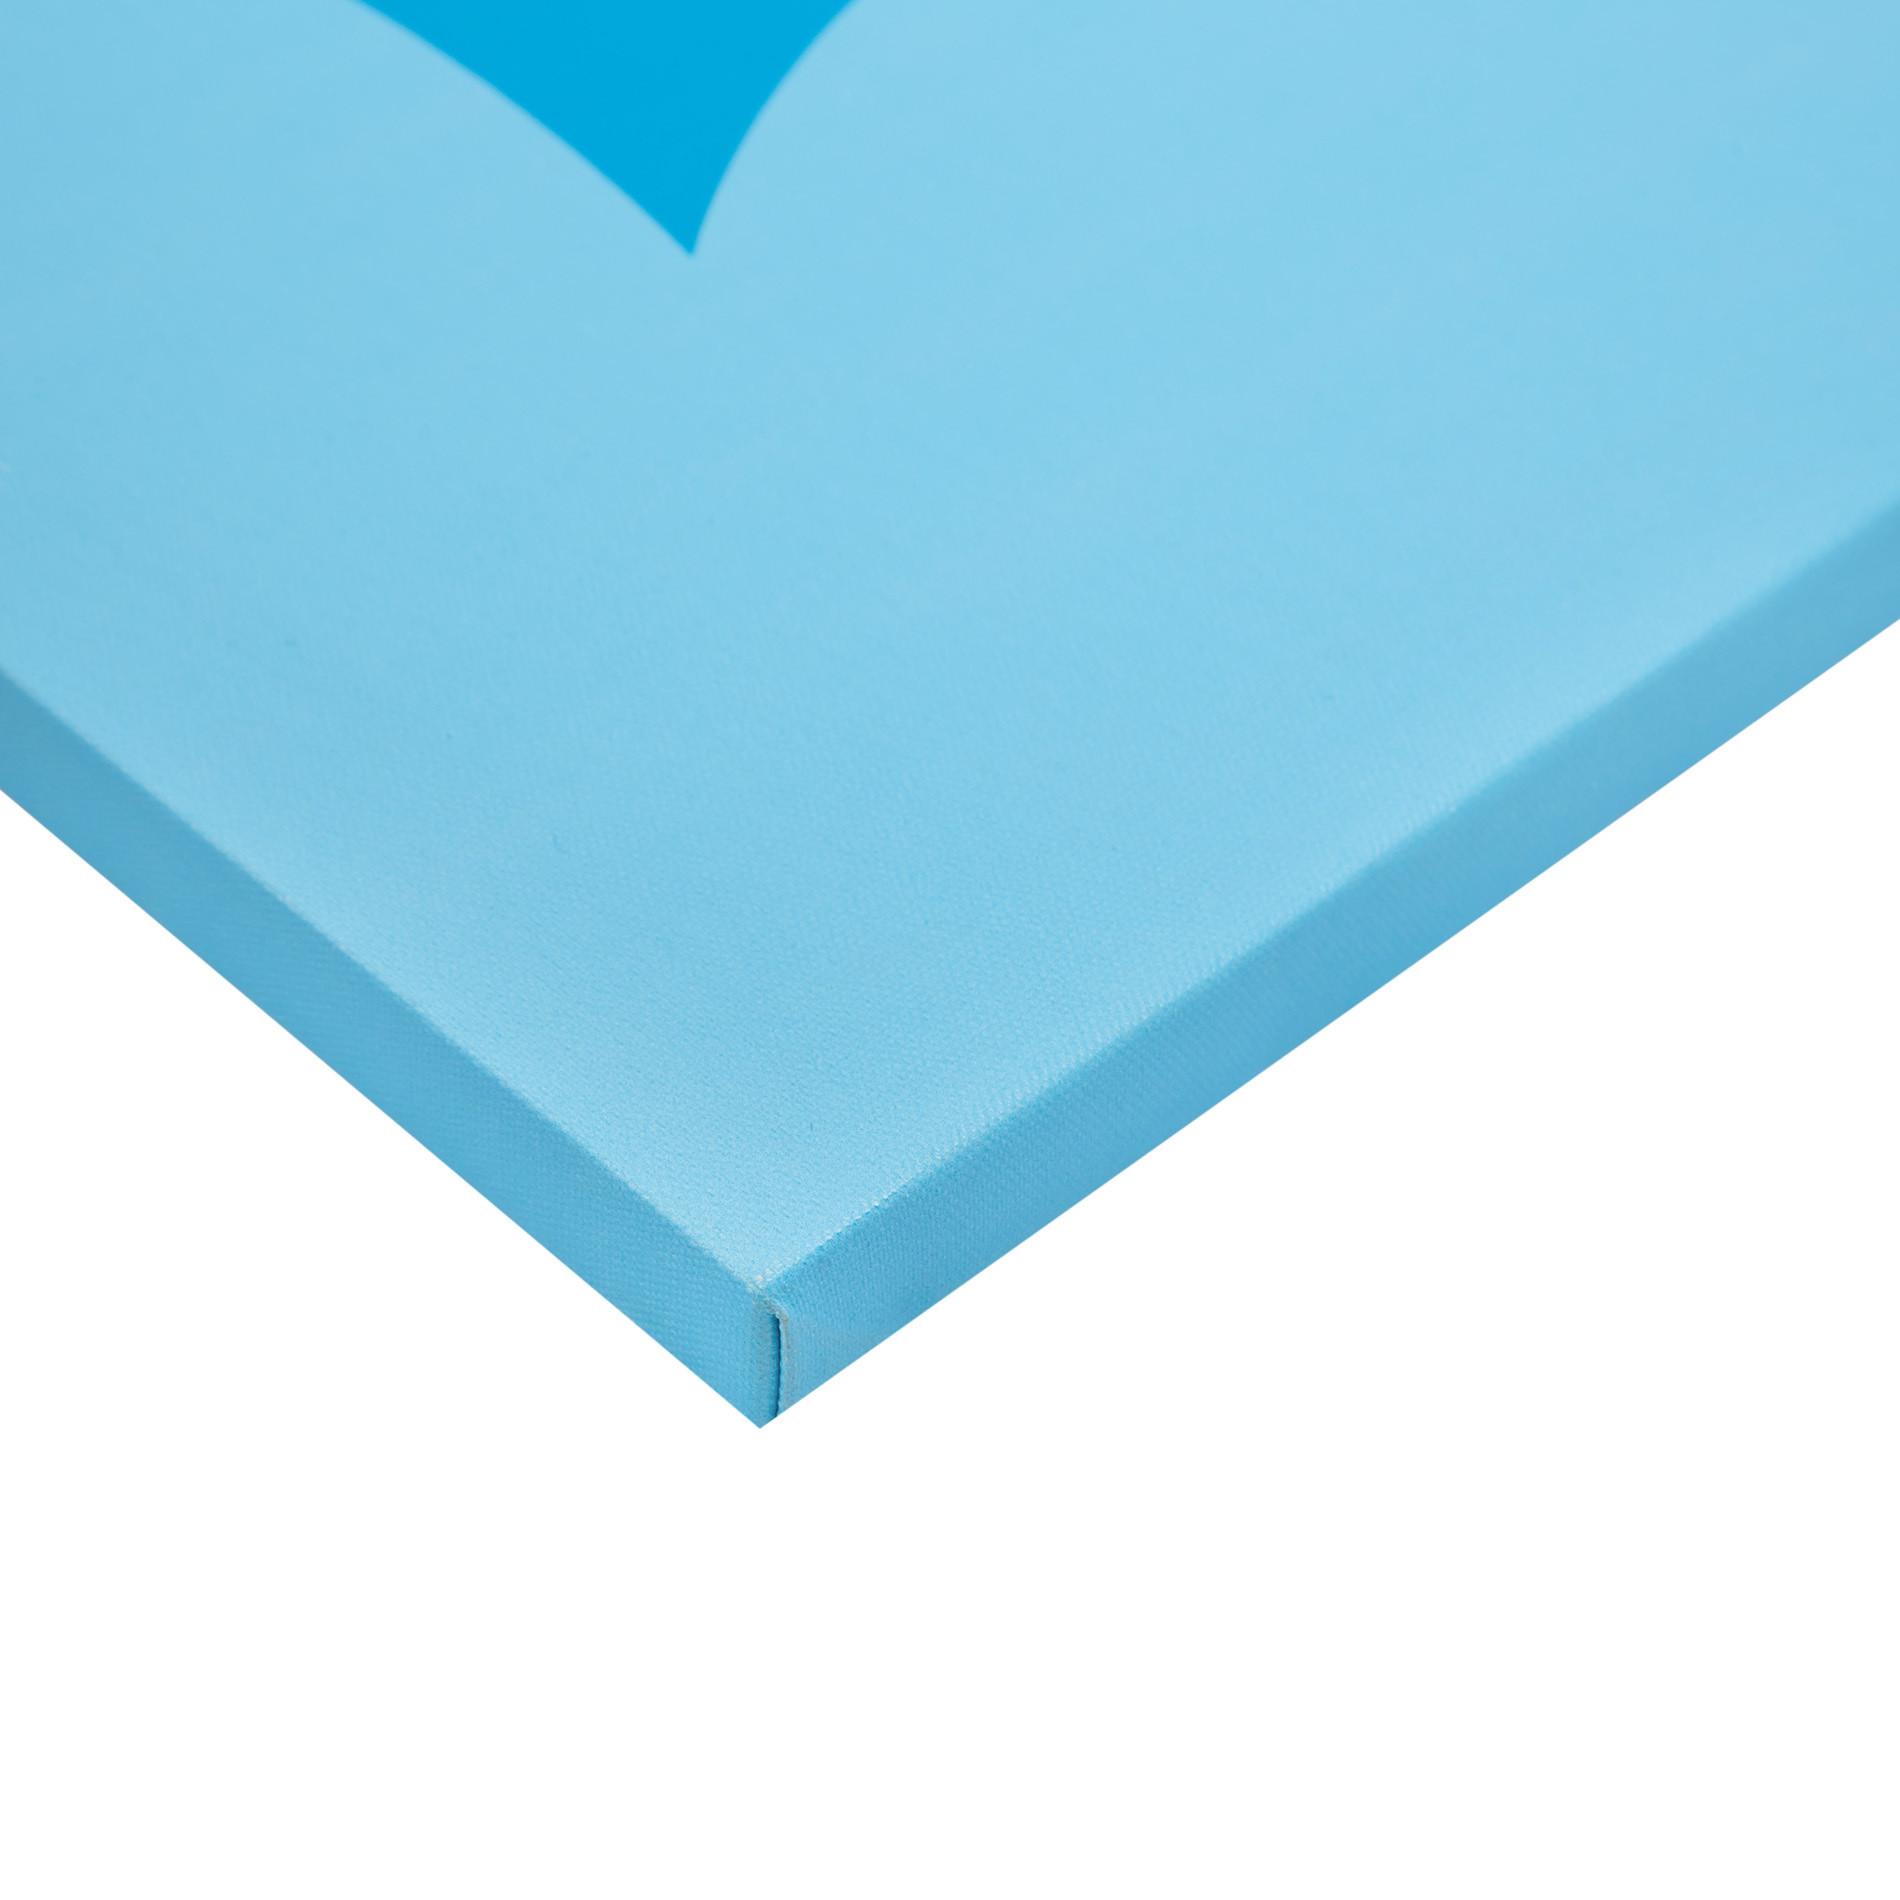 Tela con stampa fotografica occhiali, Blu, large image number 1